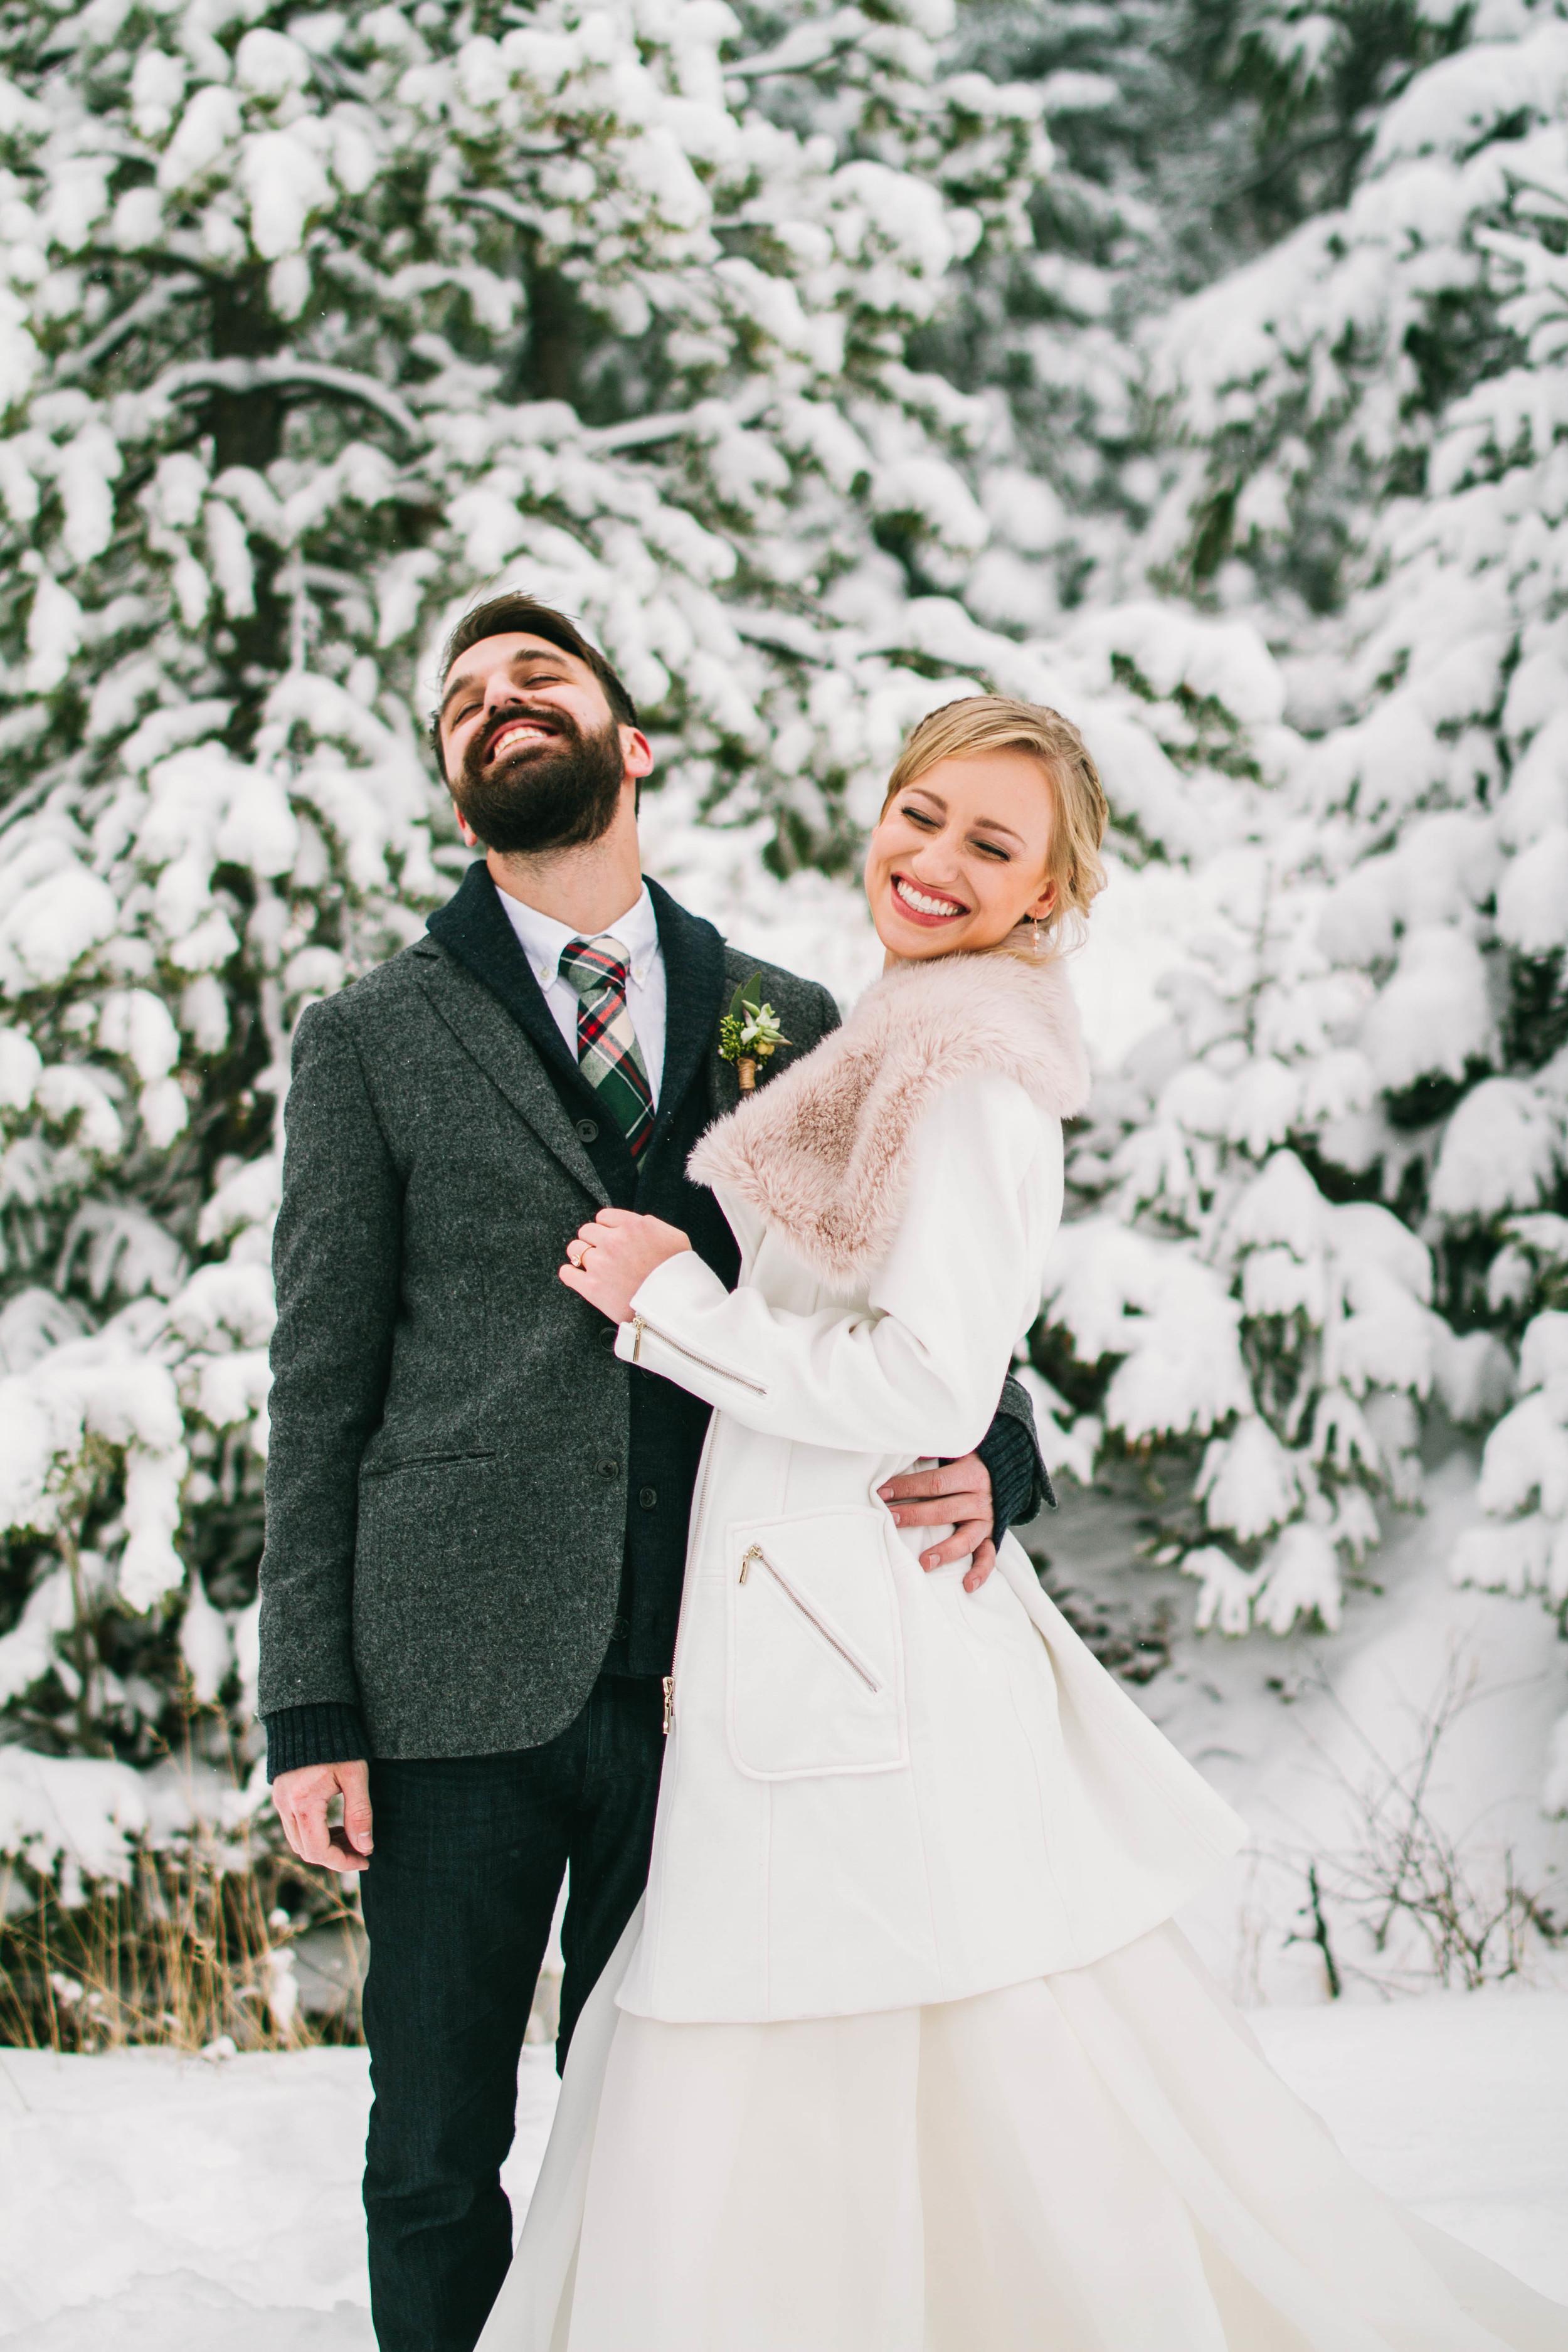 Bonin Wedding - Madeleine Bonin Photography-5766.jpg